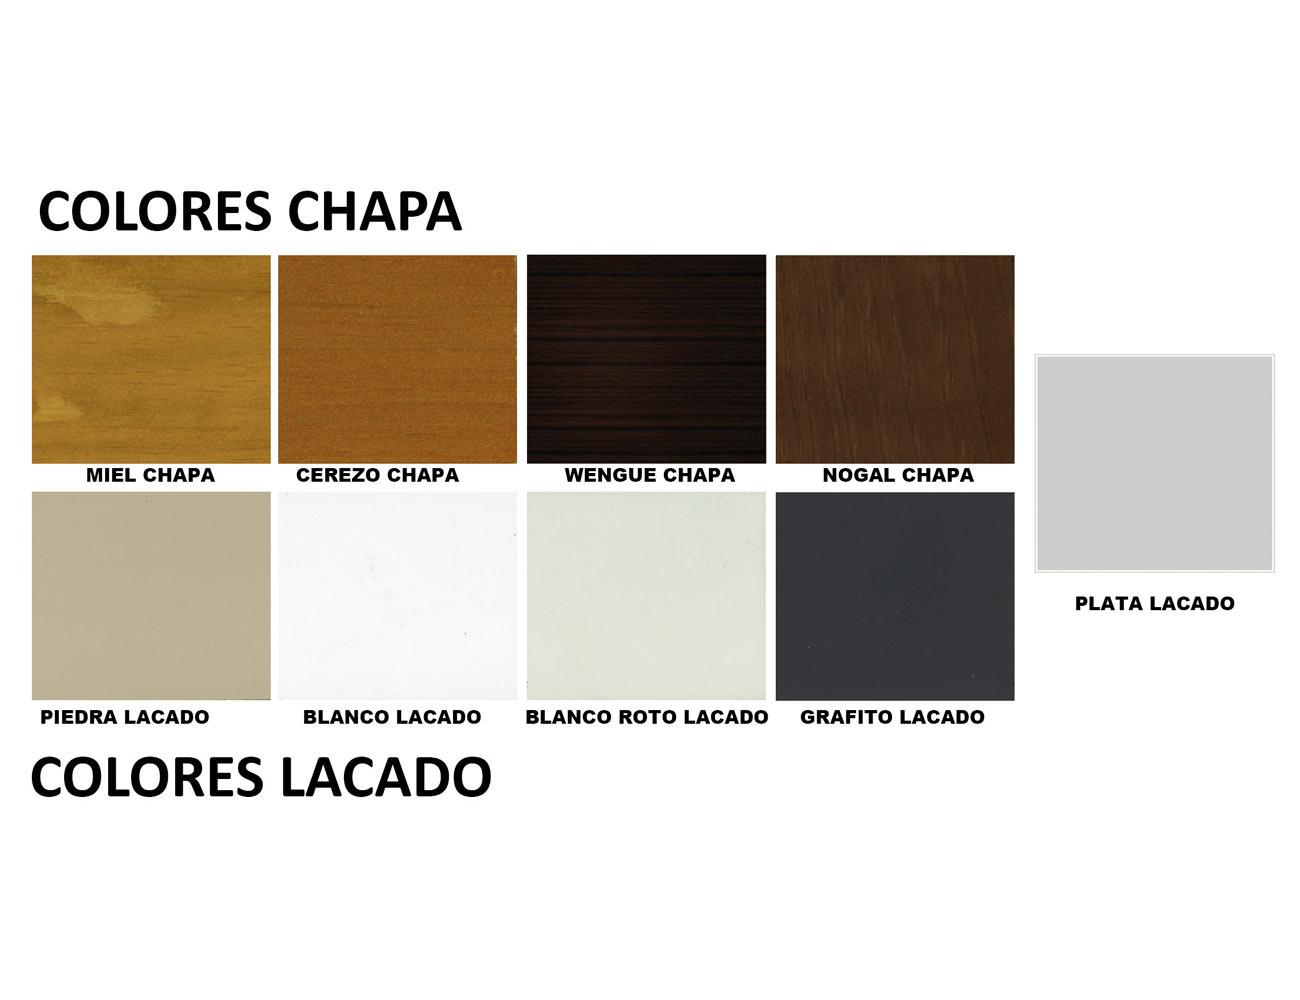 Colores216